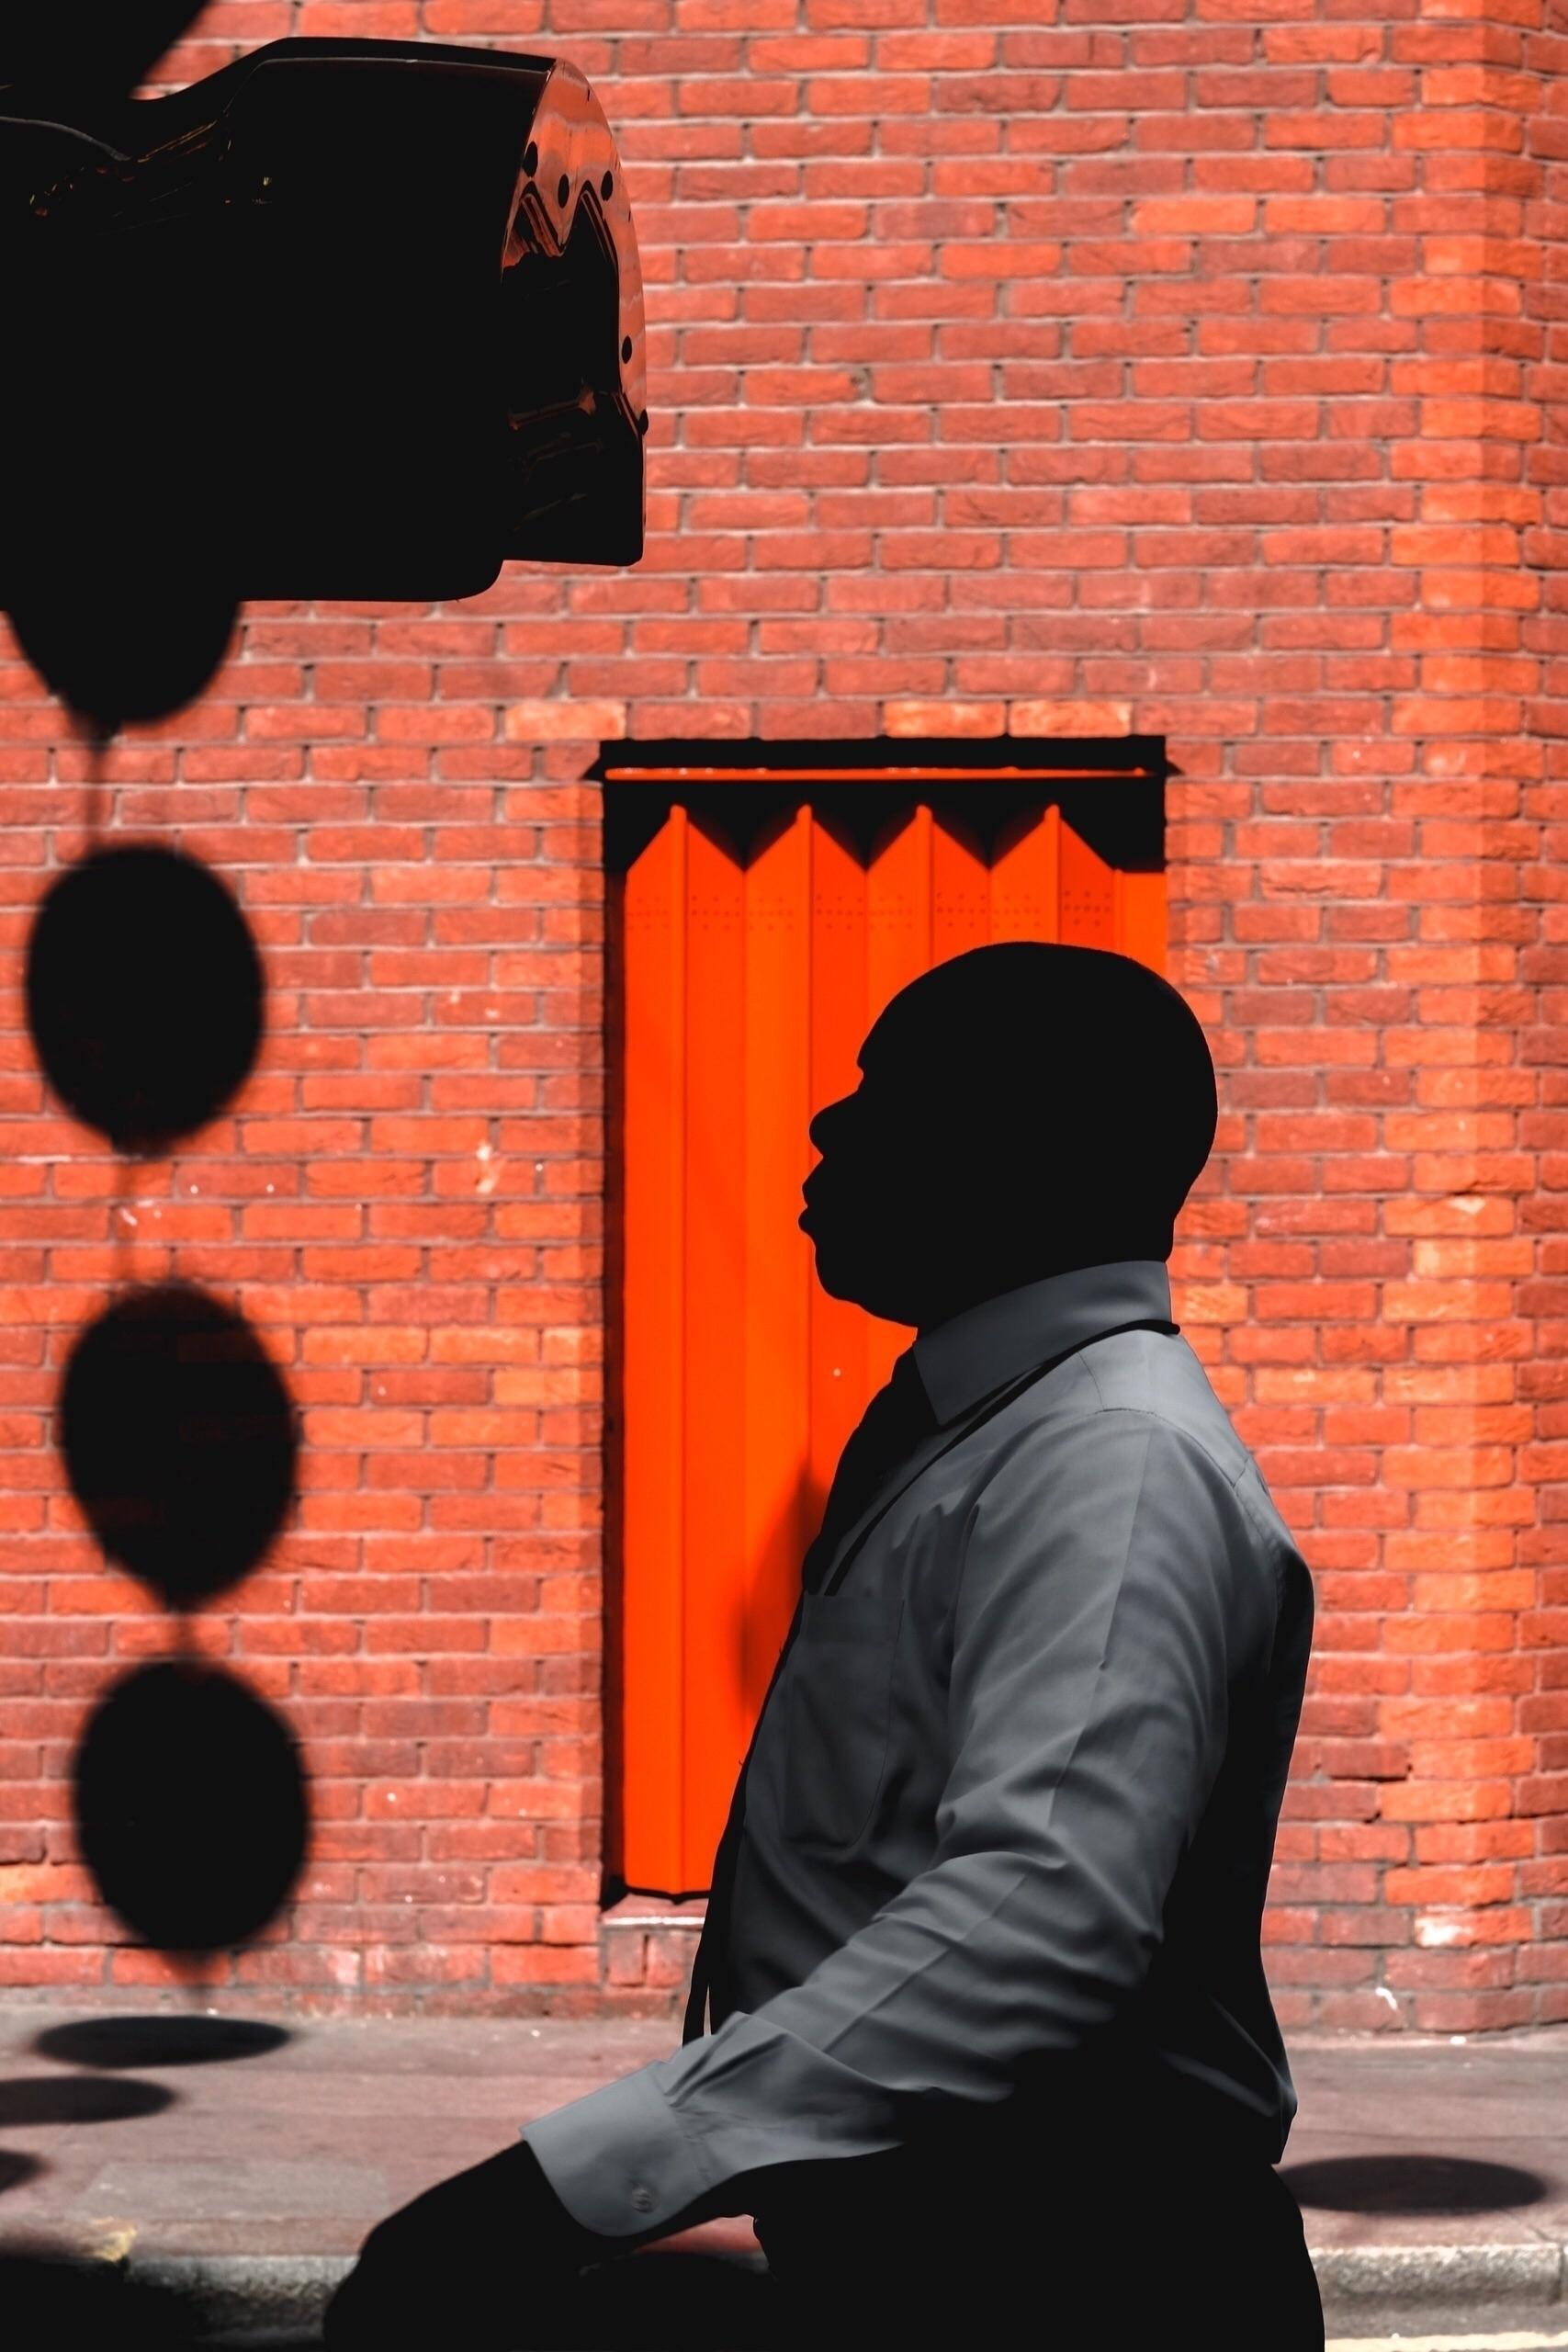 chinatown silhouette - fuji, fujifilm - sixstreetunder | ello